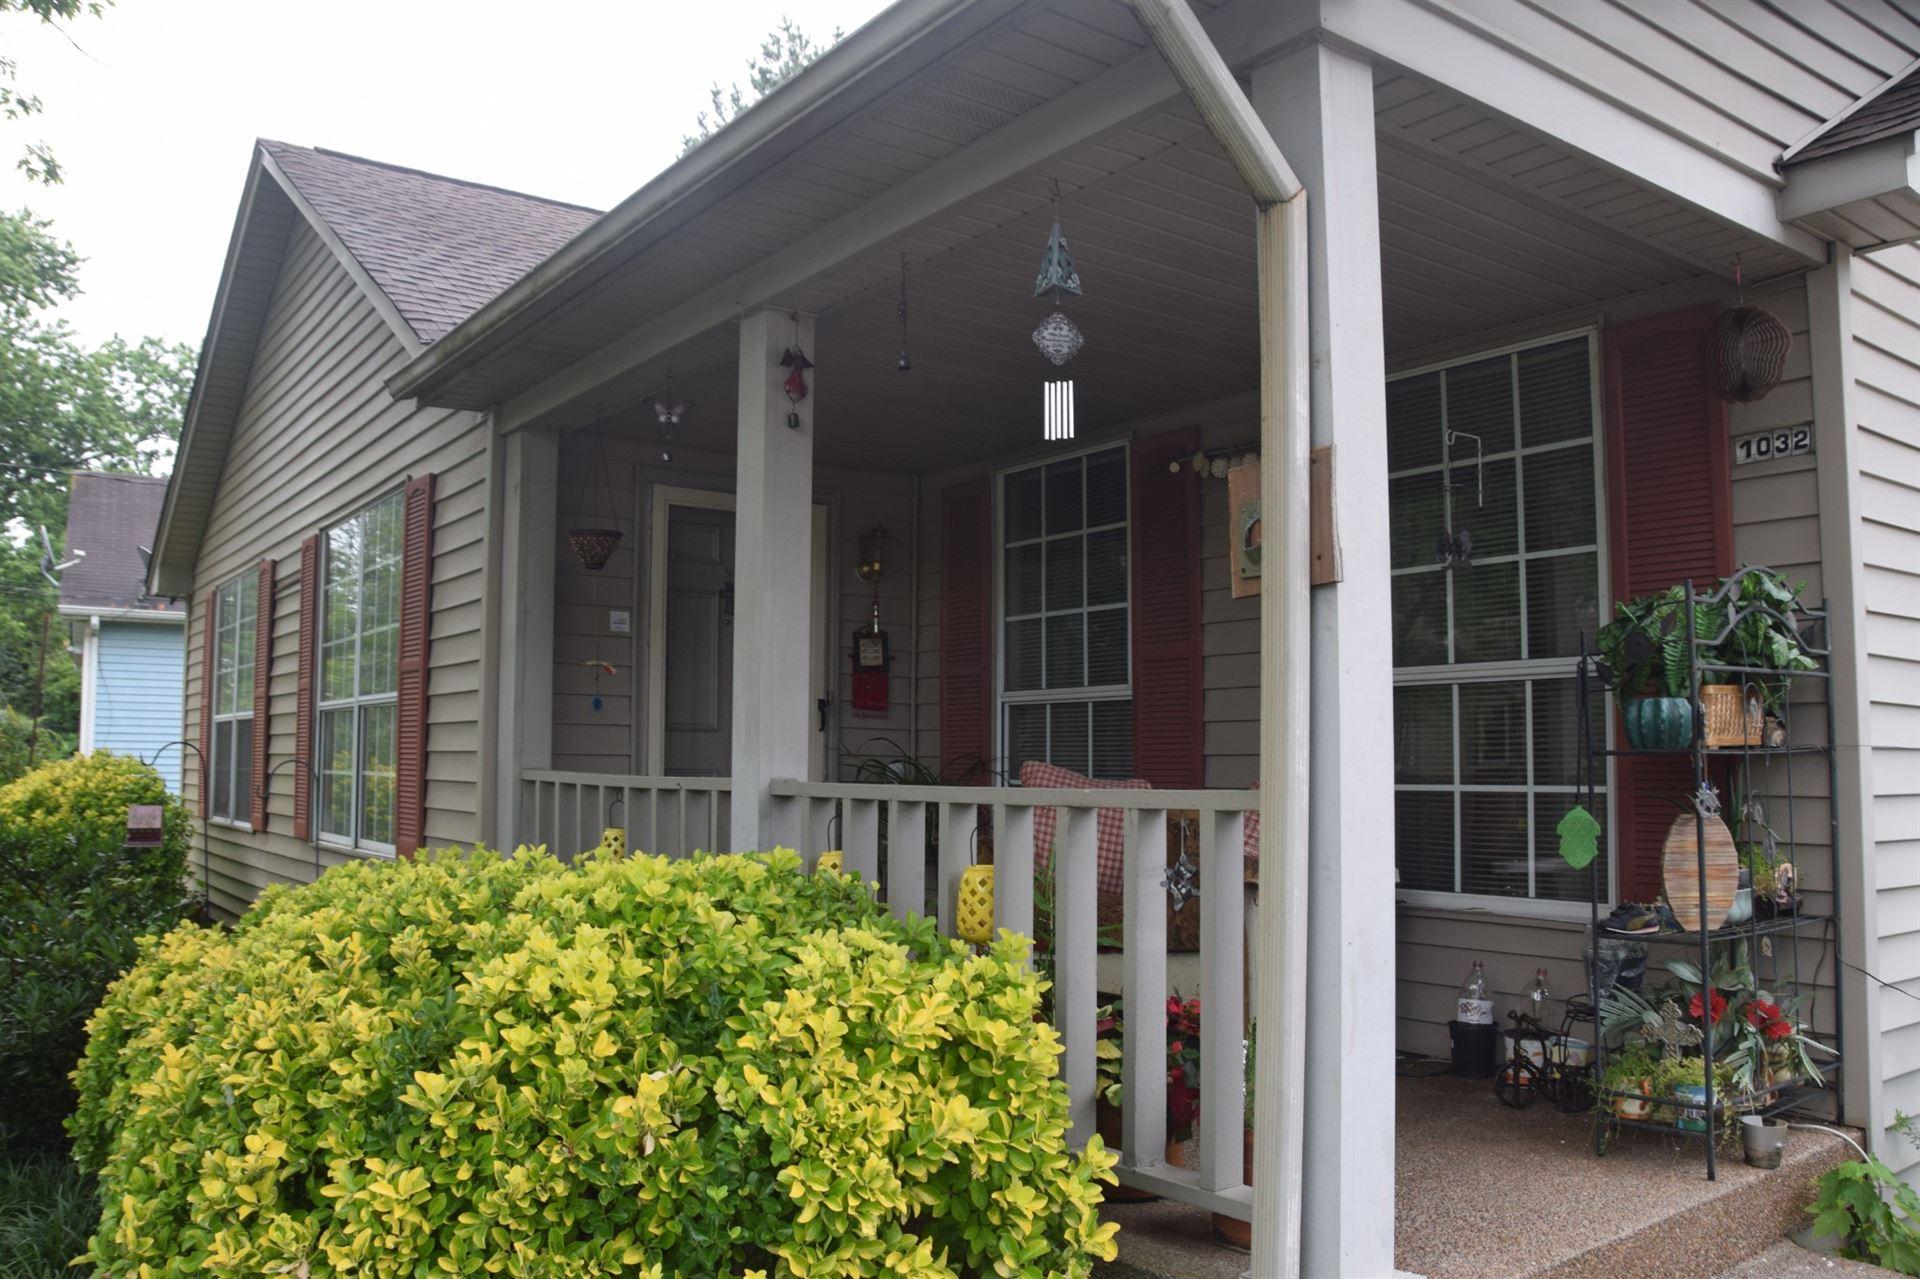 Photo of 1032 Jacksons Valley Rd, Hermitage, TN 37076 (MLS # 2161637)